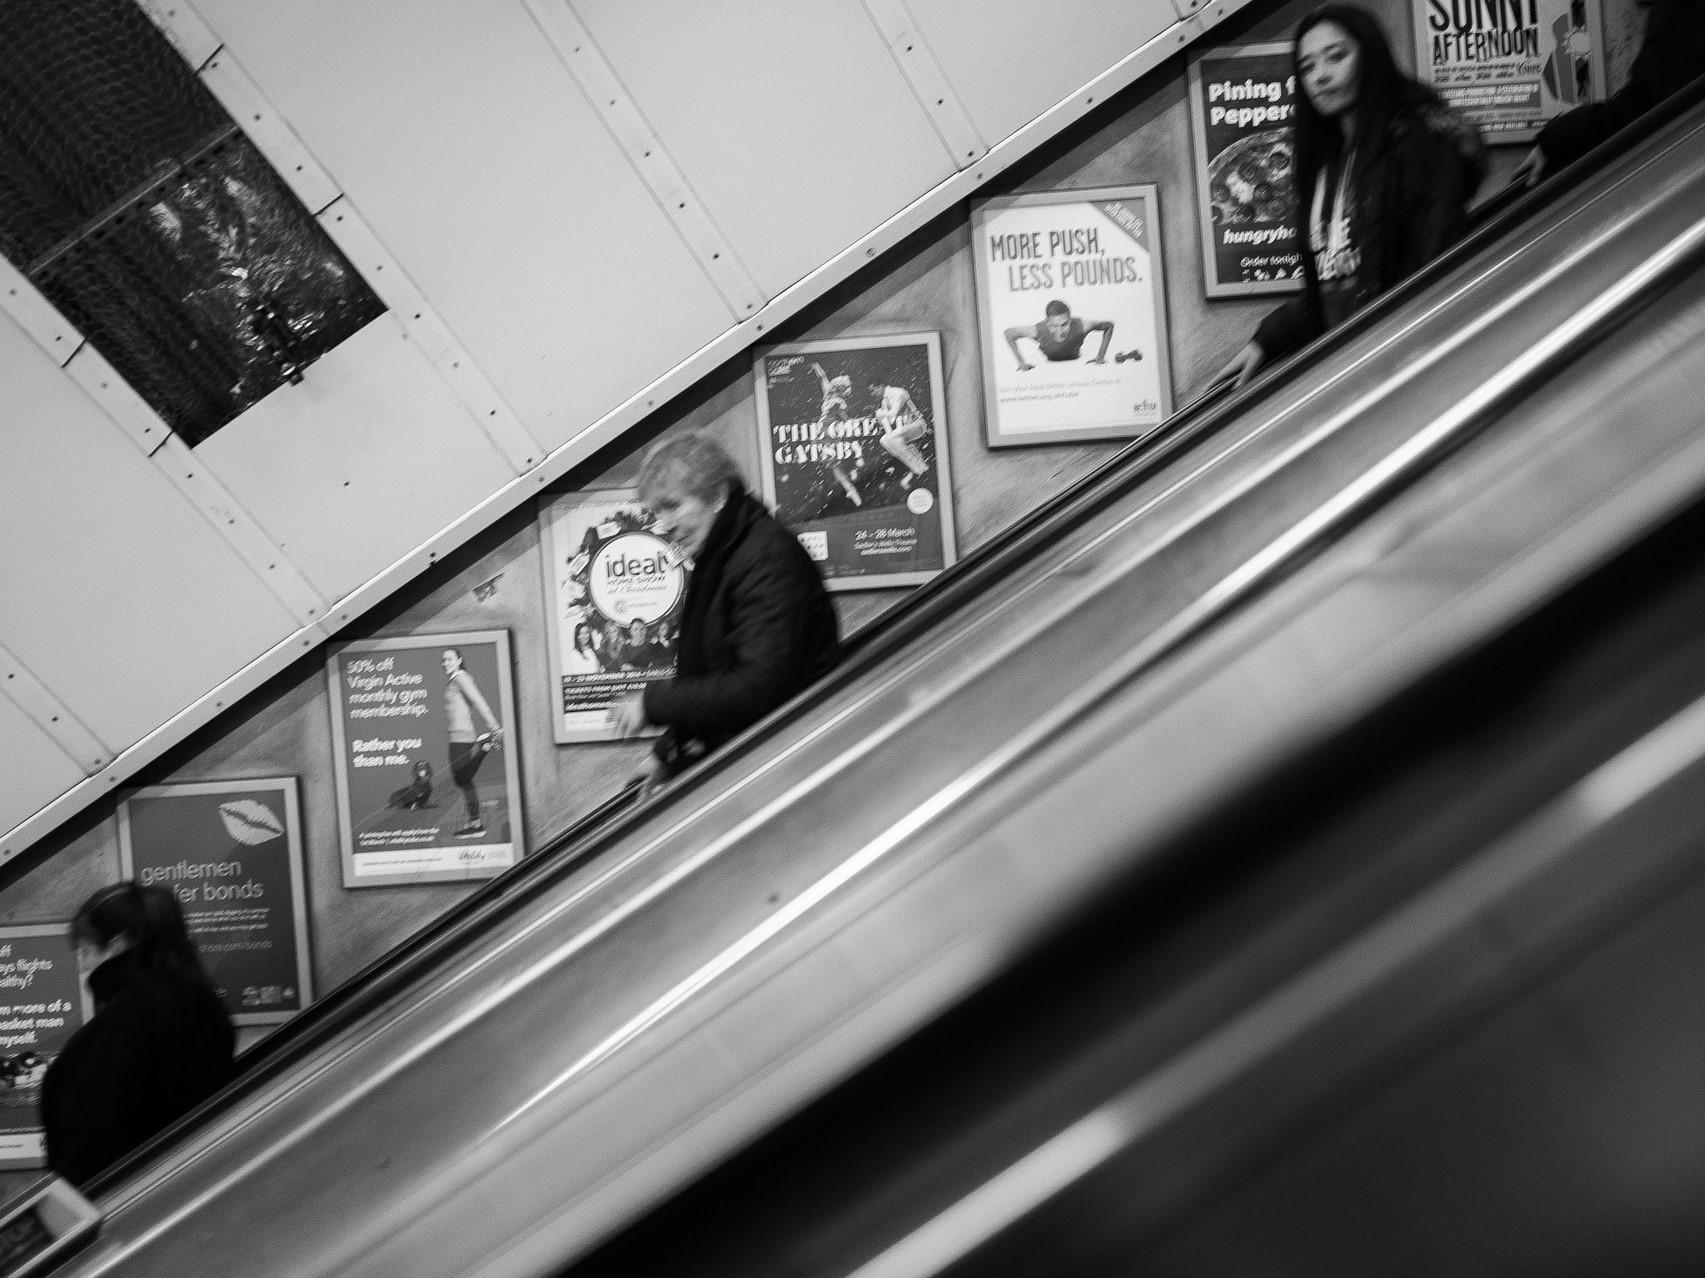 escalator-923990_1920 (2)